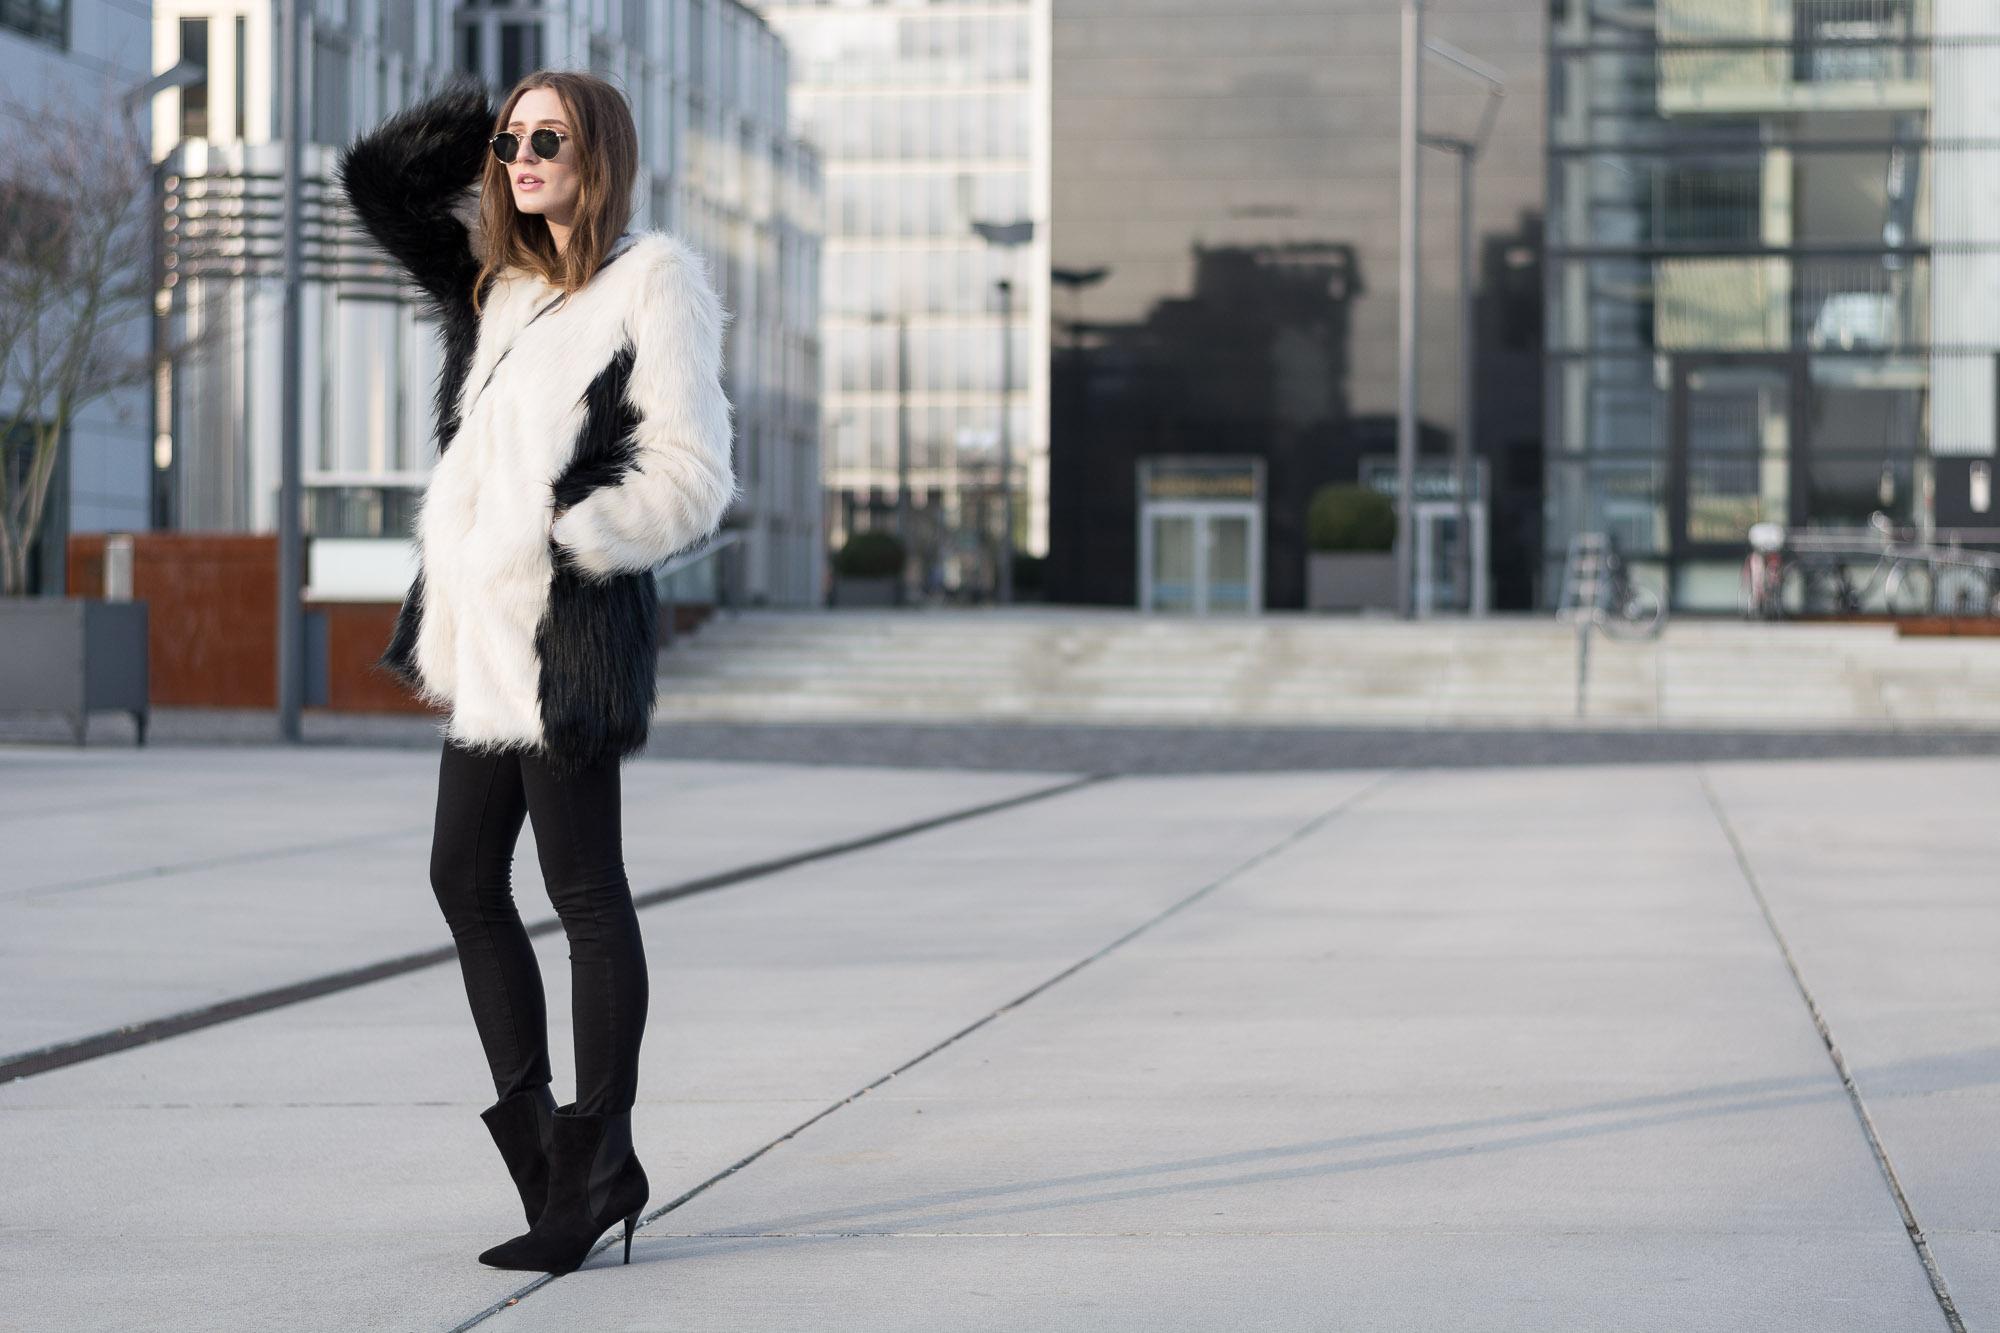 Unreal Fur Coat & Peter Kaiser Ankle Boots | Lisa Fiege